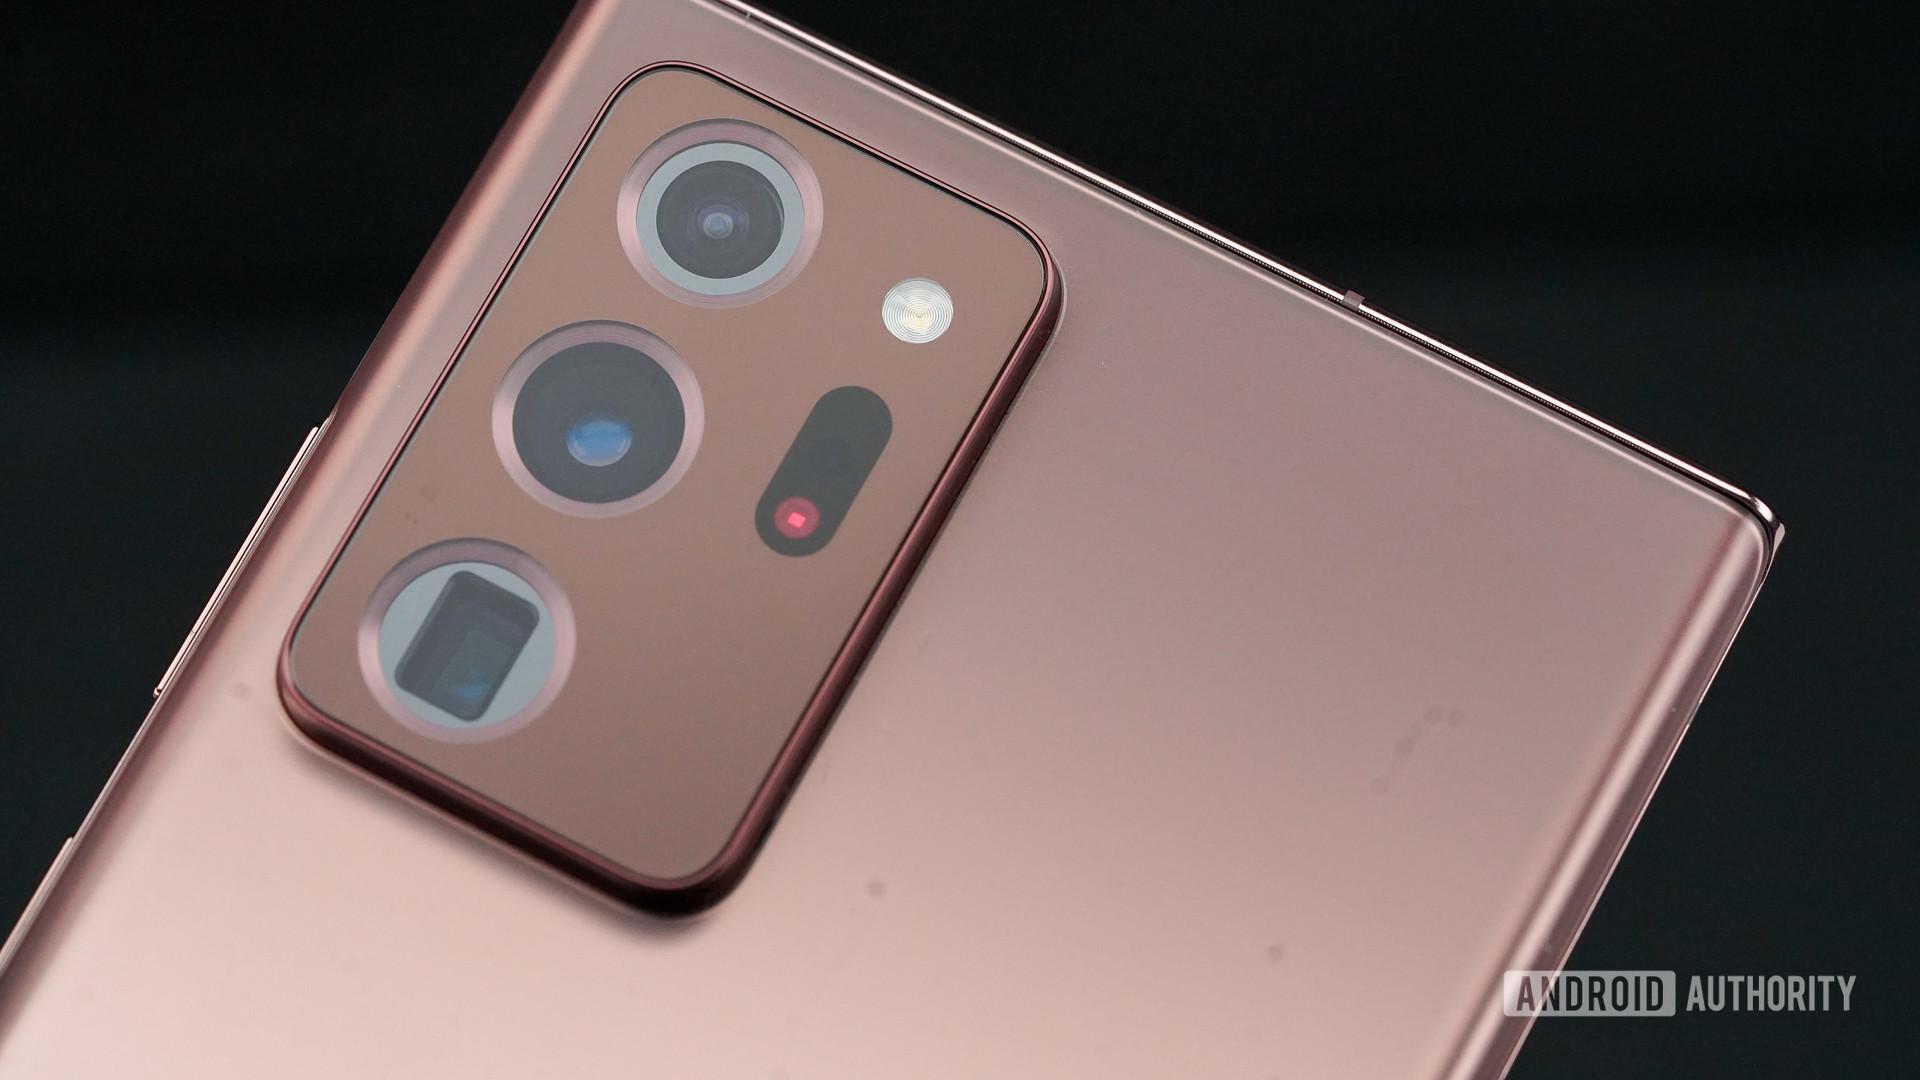 Samsung Galaxy Note 20 Ultra camera angled